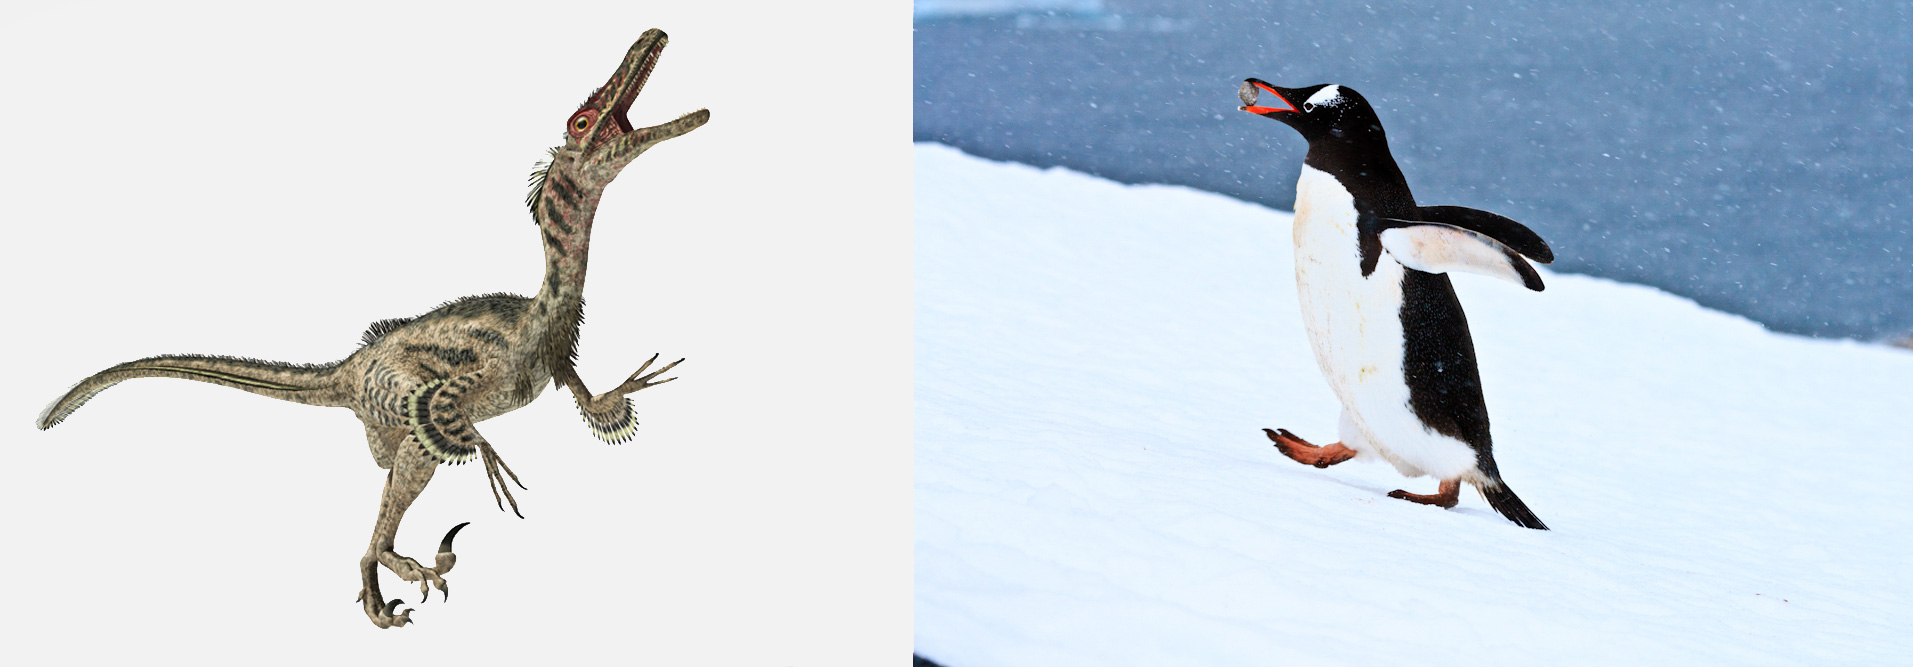 Velociraptor and Gentoo Penguin. Illustration: Stocktrek Images, Inc./Alamy, photo: Ken Zaremba/Audubon Photography Awards